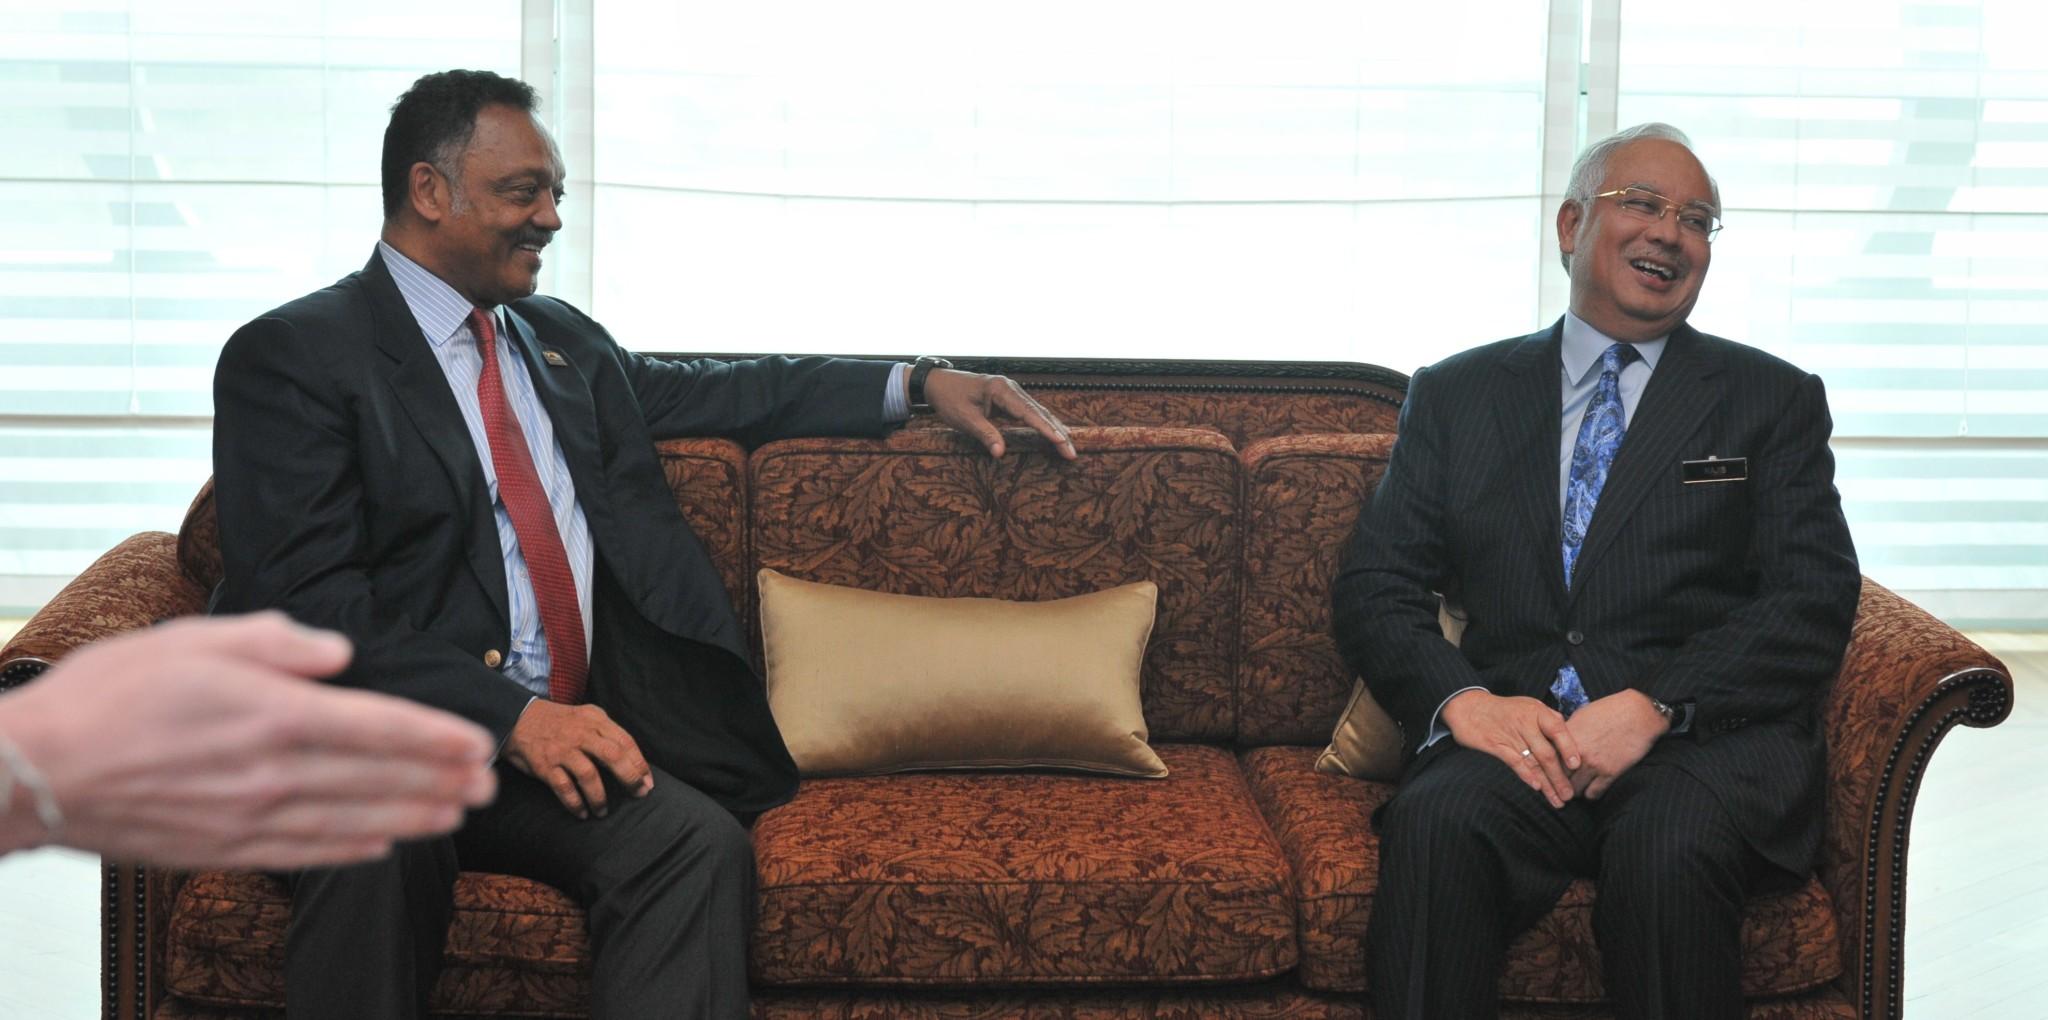 Rev. Jesse L. Jackson with HE Dato' Sri Mohd Najib Tun Abdul Razak, Prime Minister of Malaysia